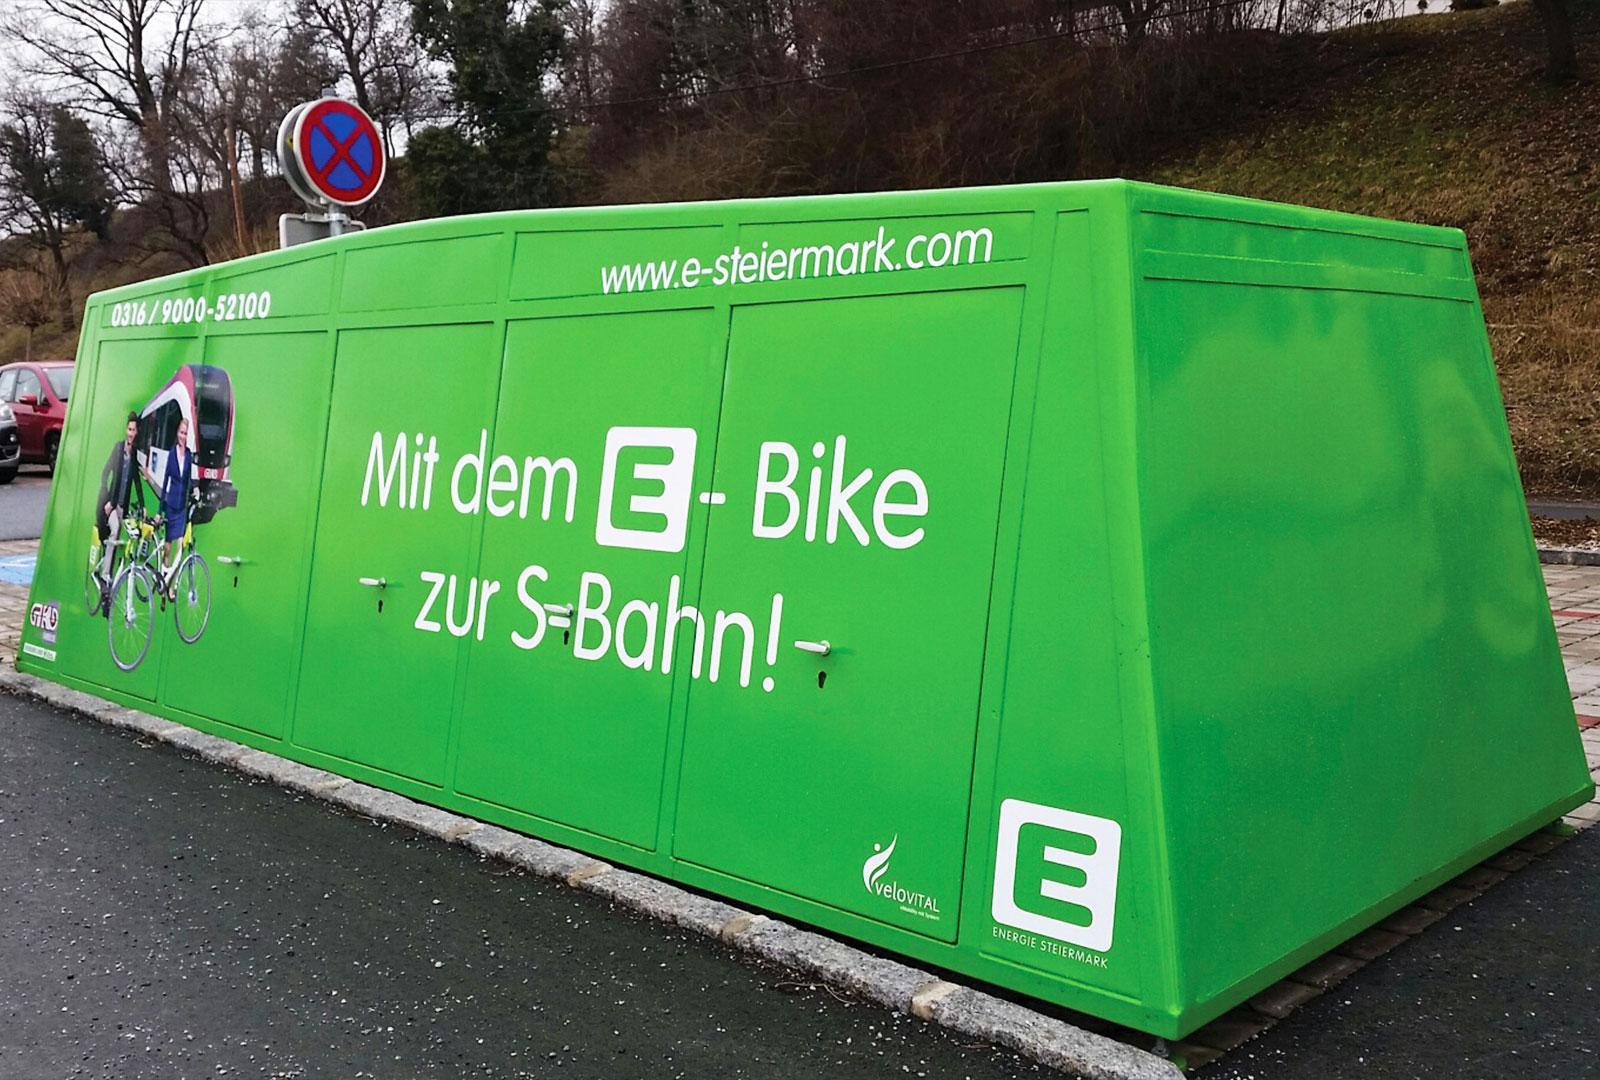 E-Bike – S-Bahn 2